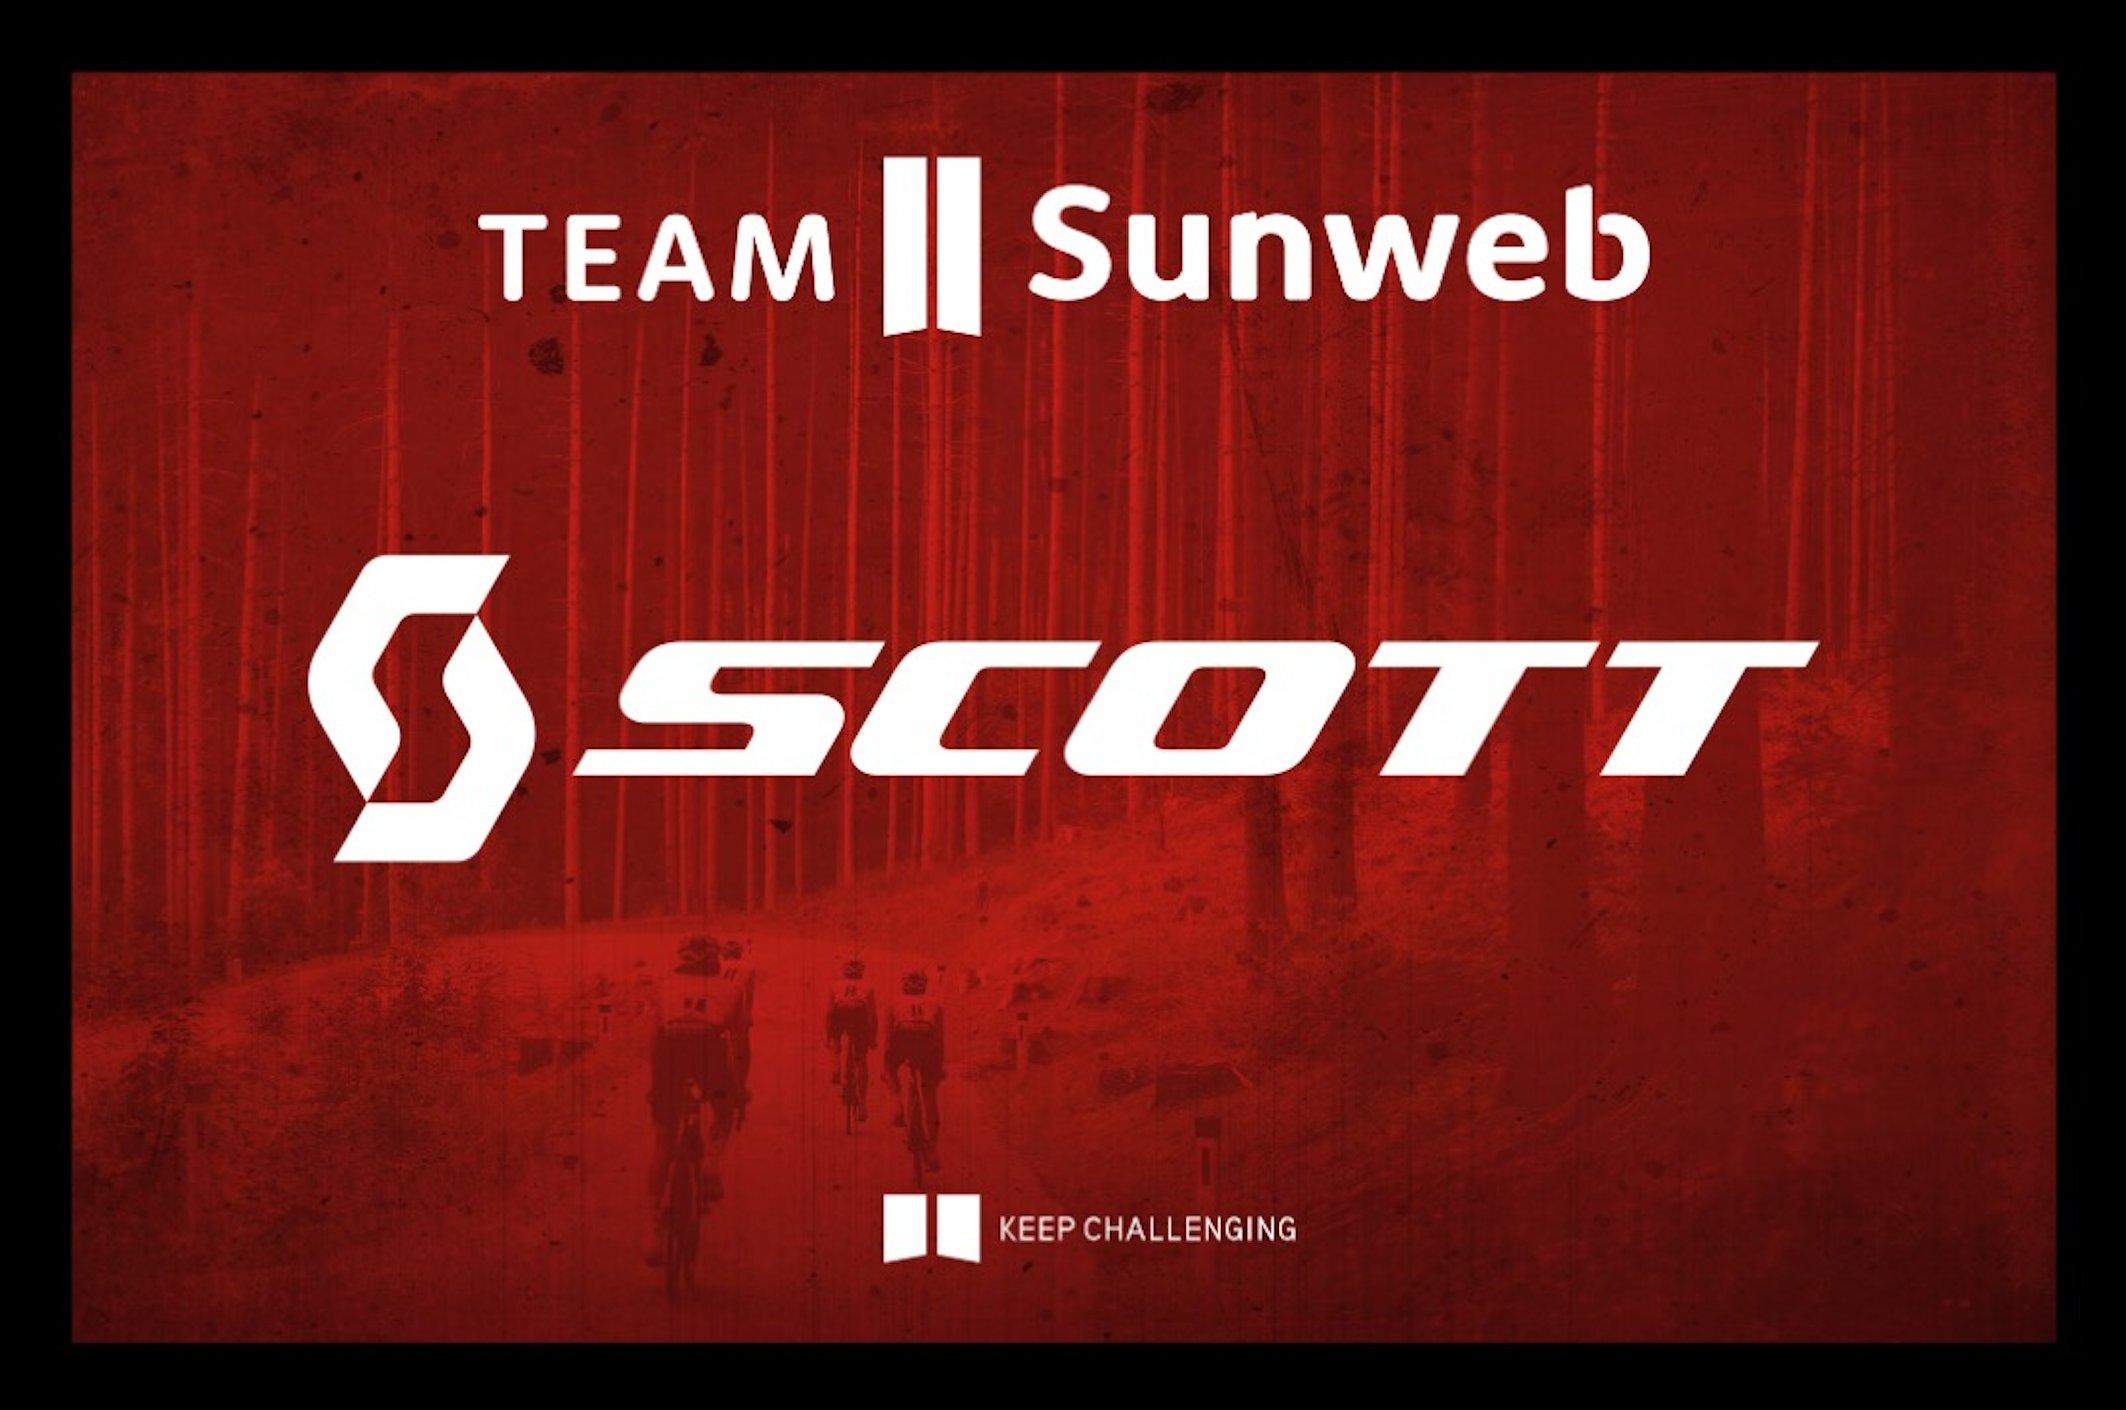 El Sunweb usará bicicletas Scott a partir de 2021.